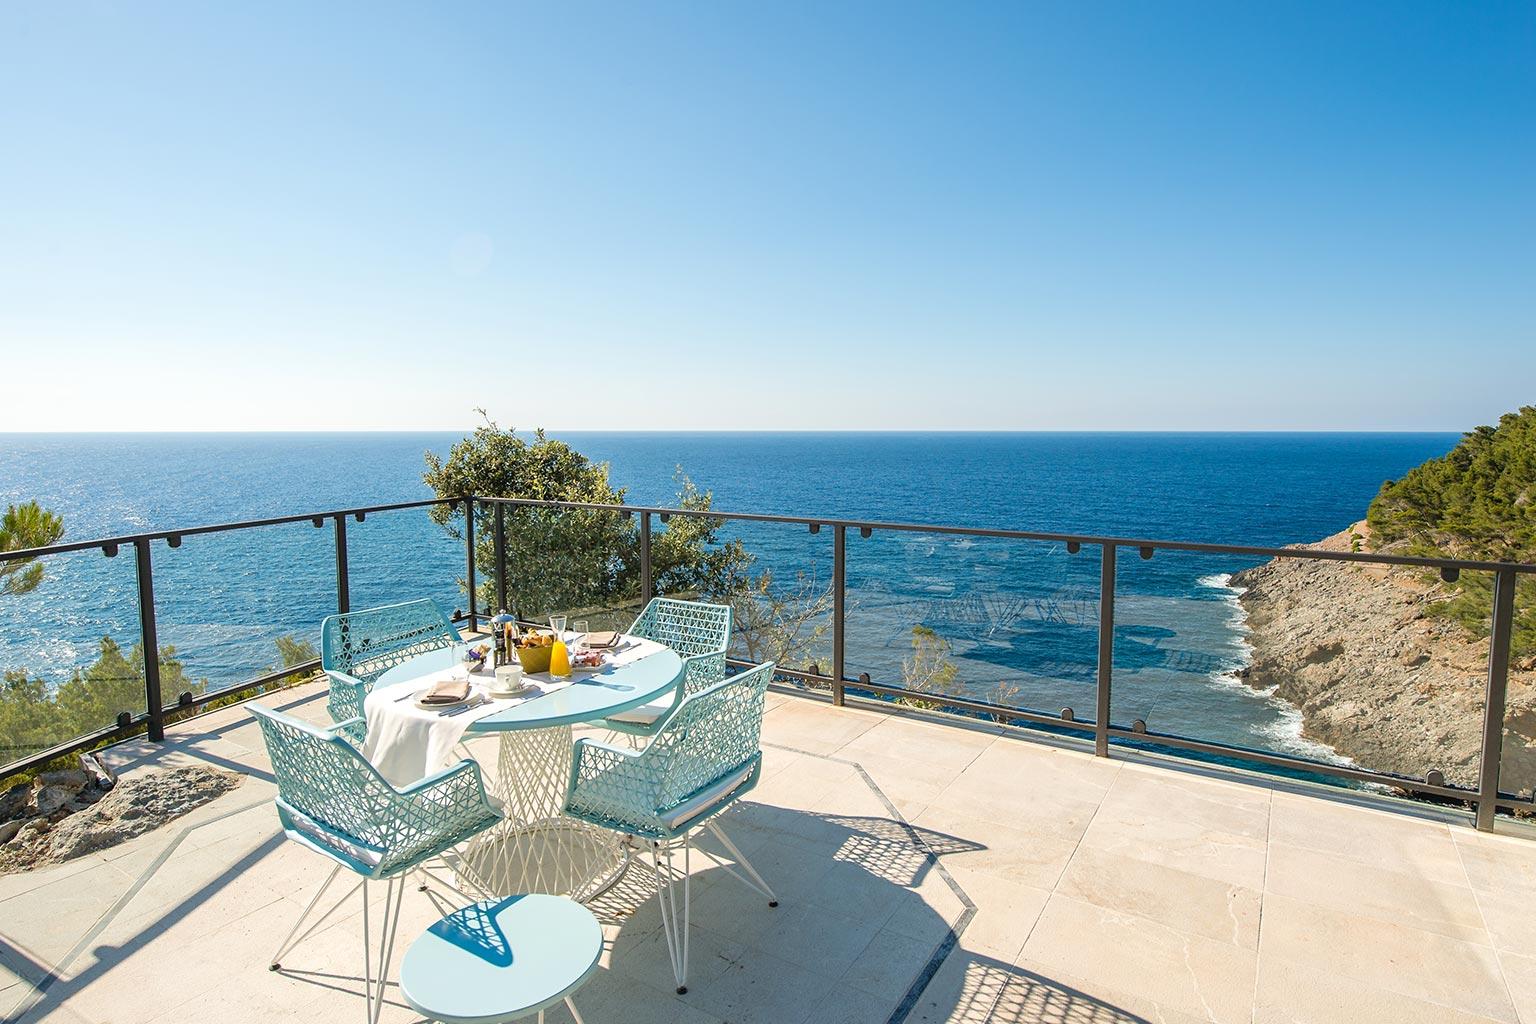 Jumeirah port soller hotel spa designreisen for Design hotels auf mallorca